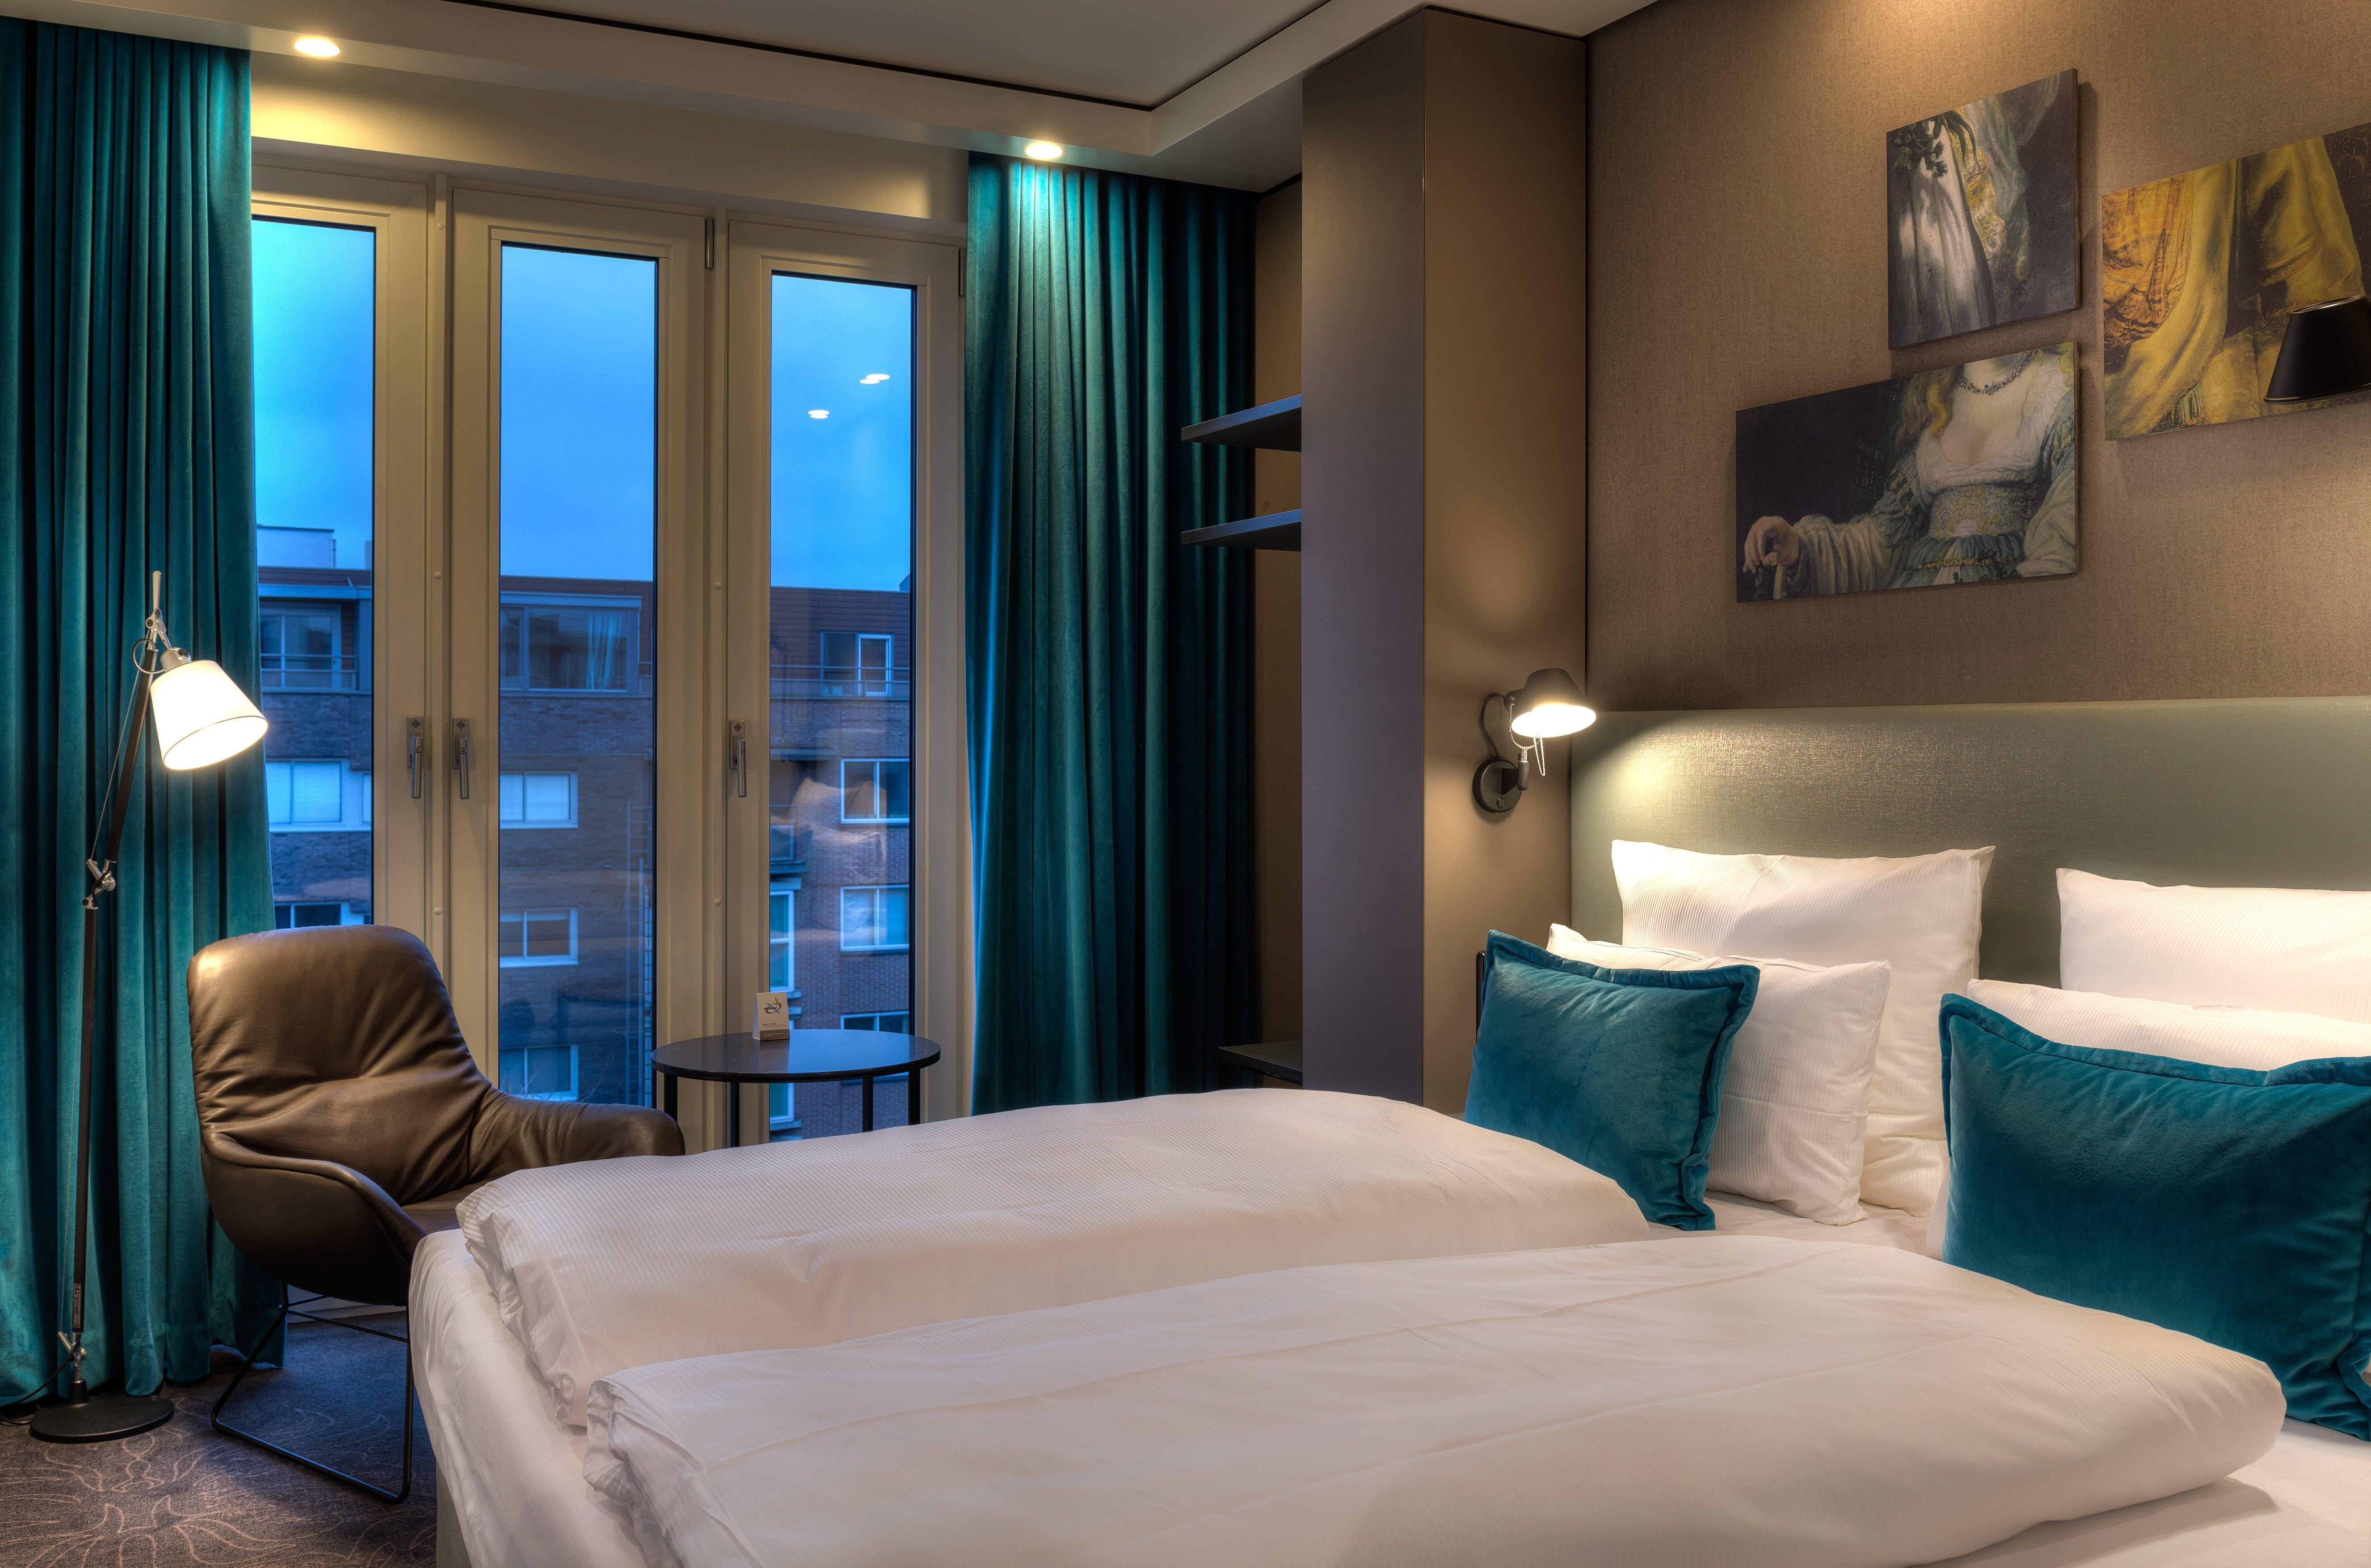 Motel One room